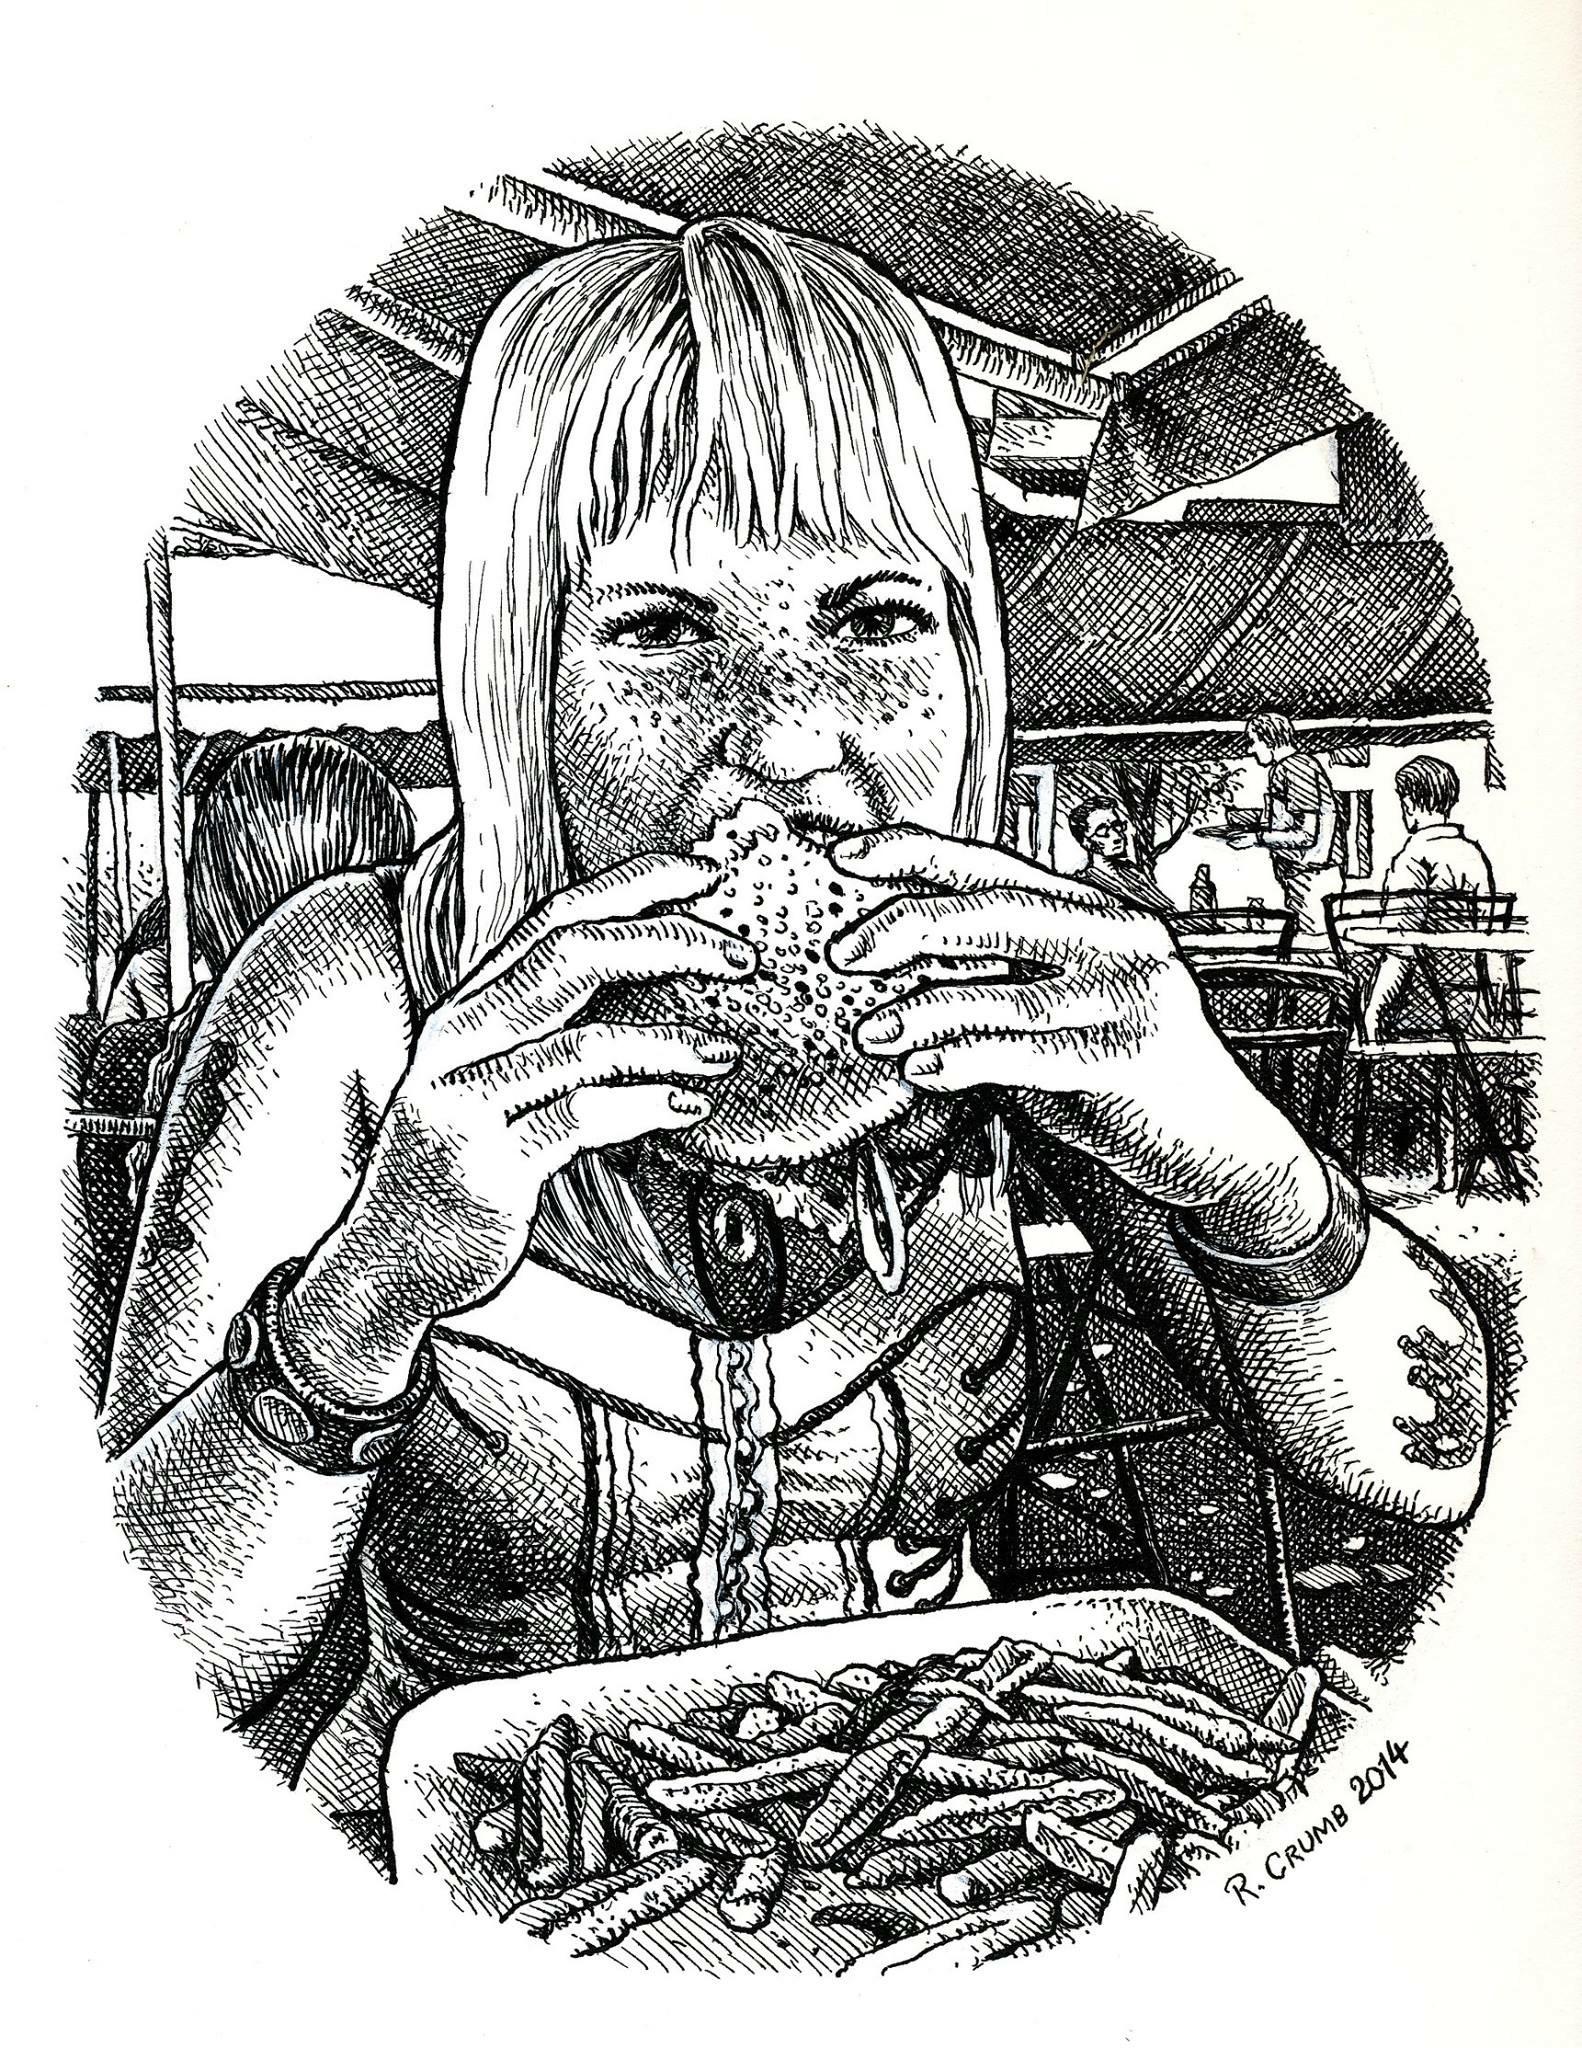 eden brower eating burger r. crumb drawing art & beauty